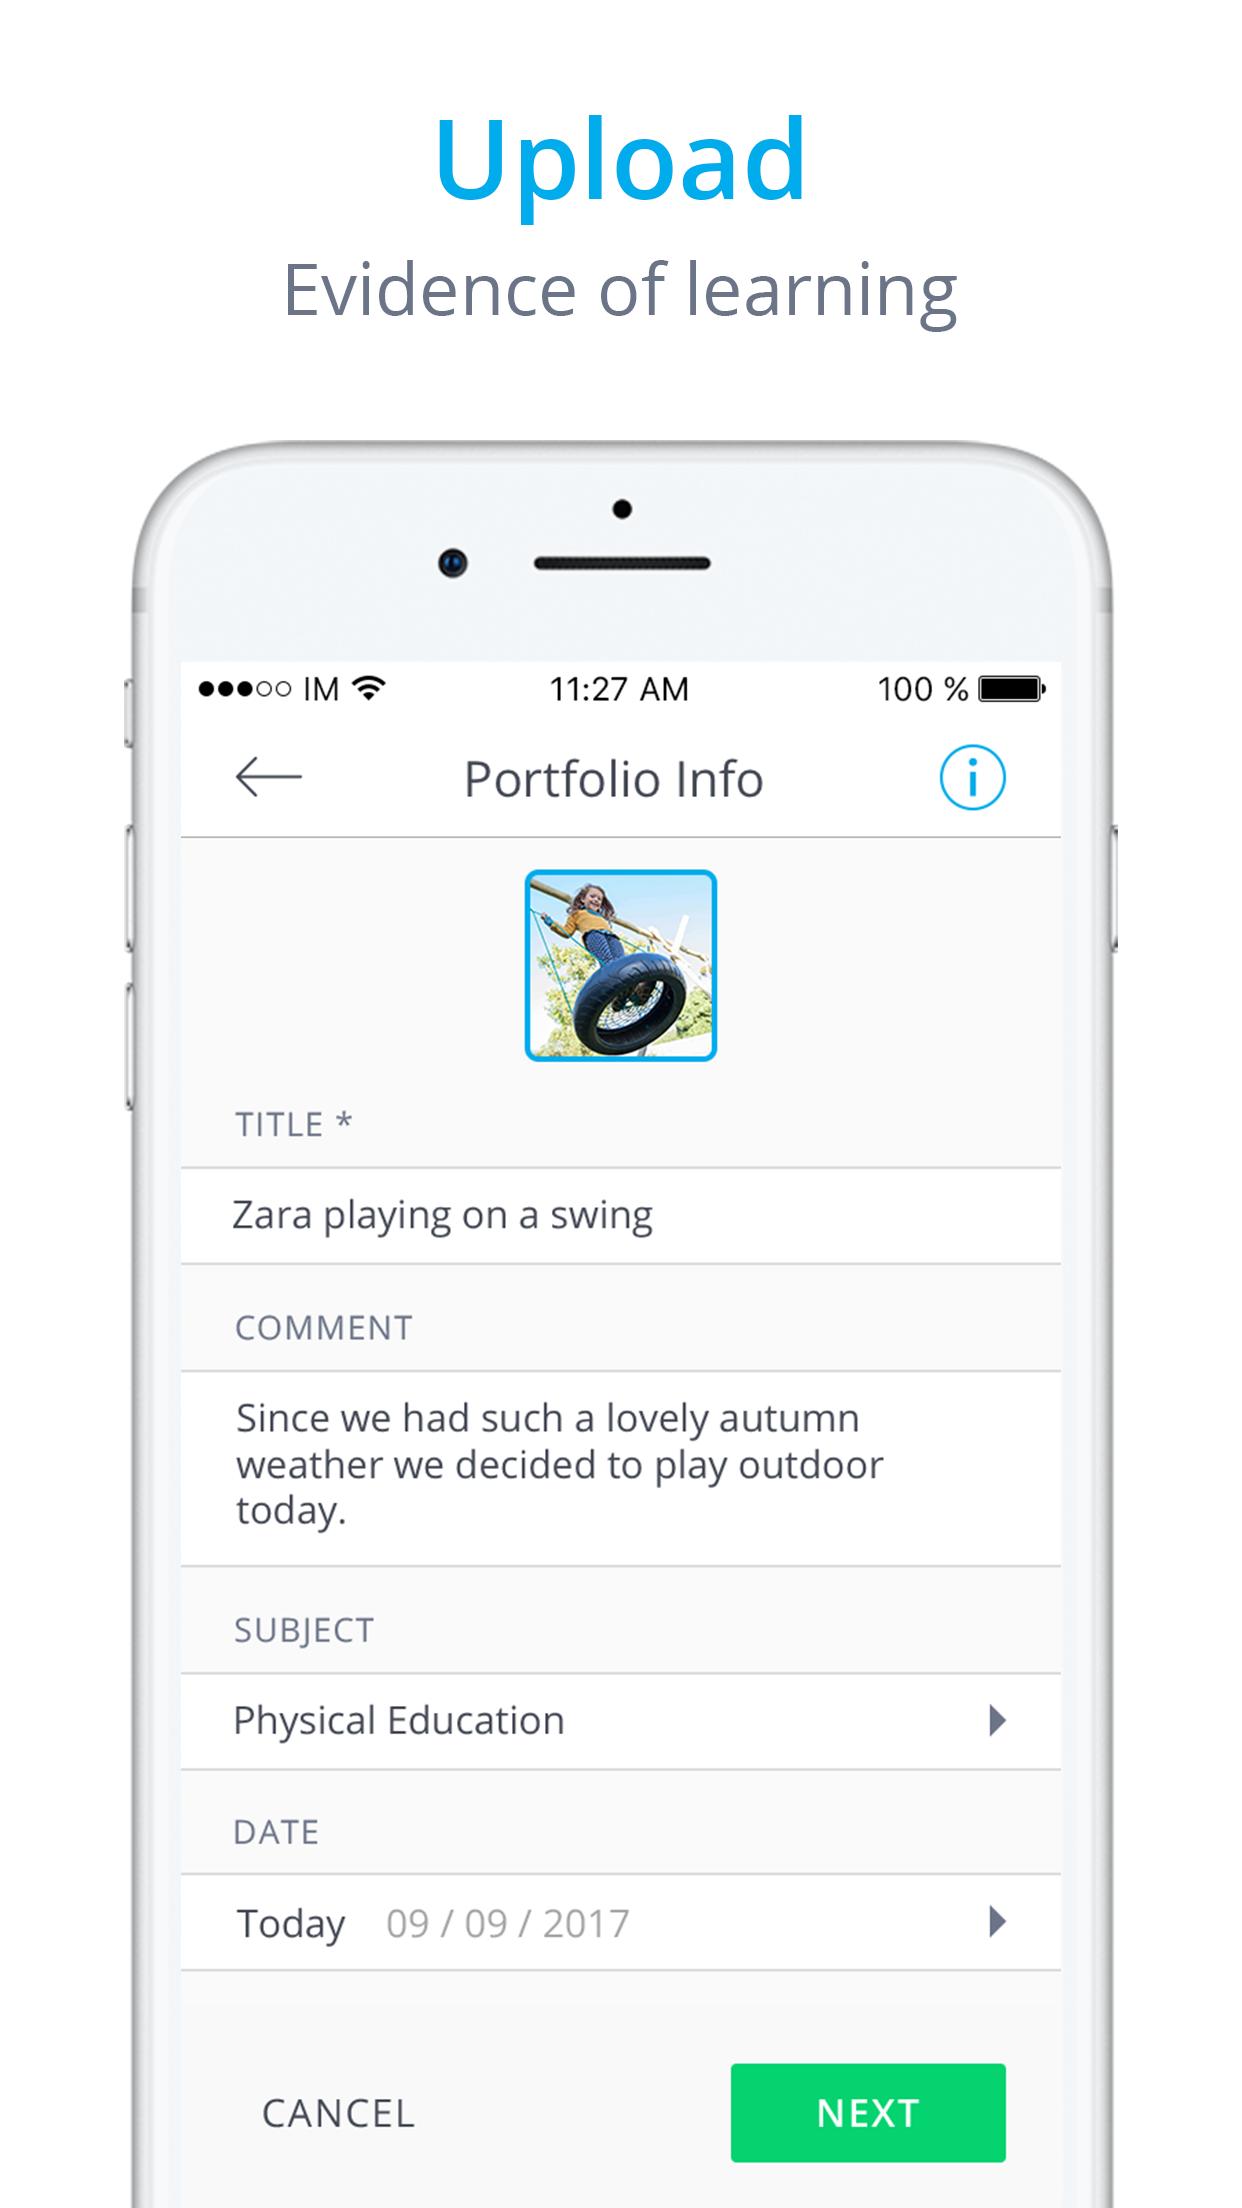 InfoMentor Media App - iPhone Screenshot 2B.png